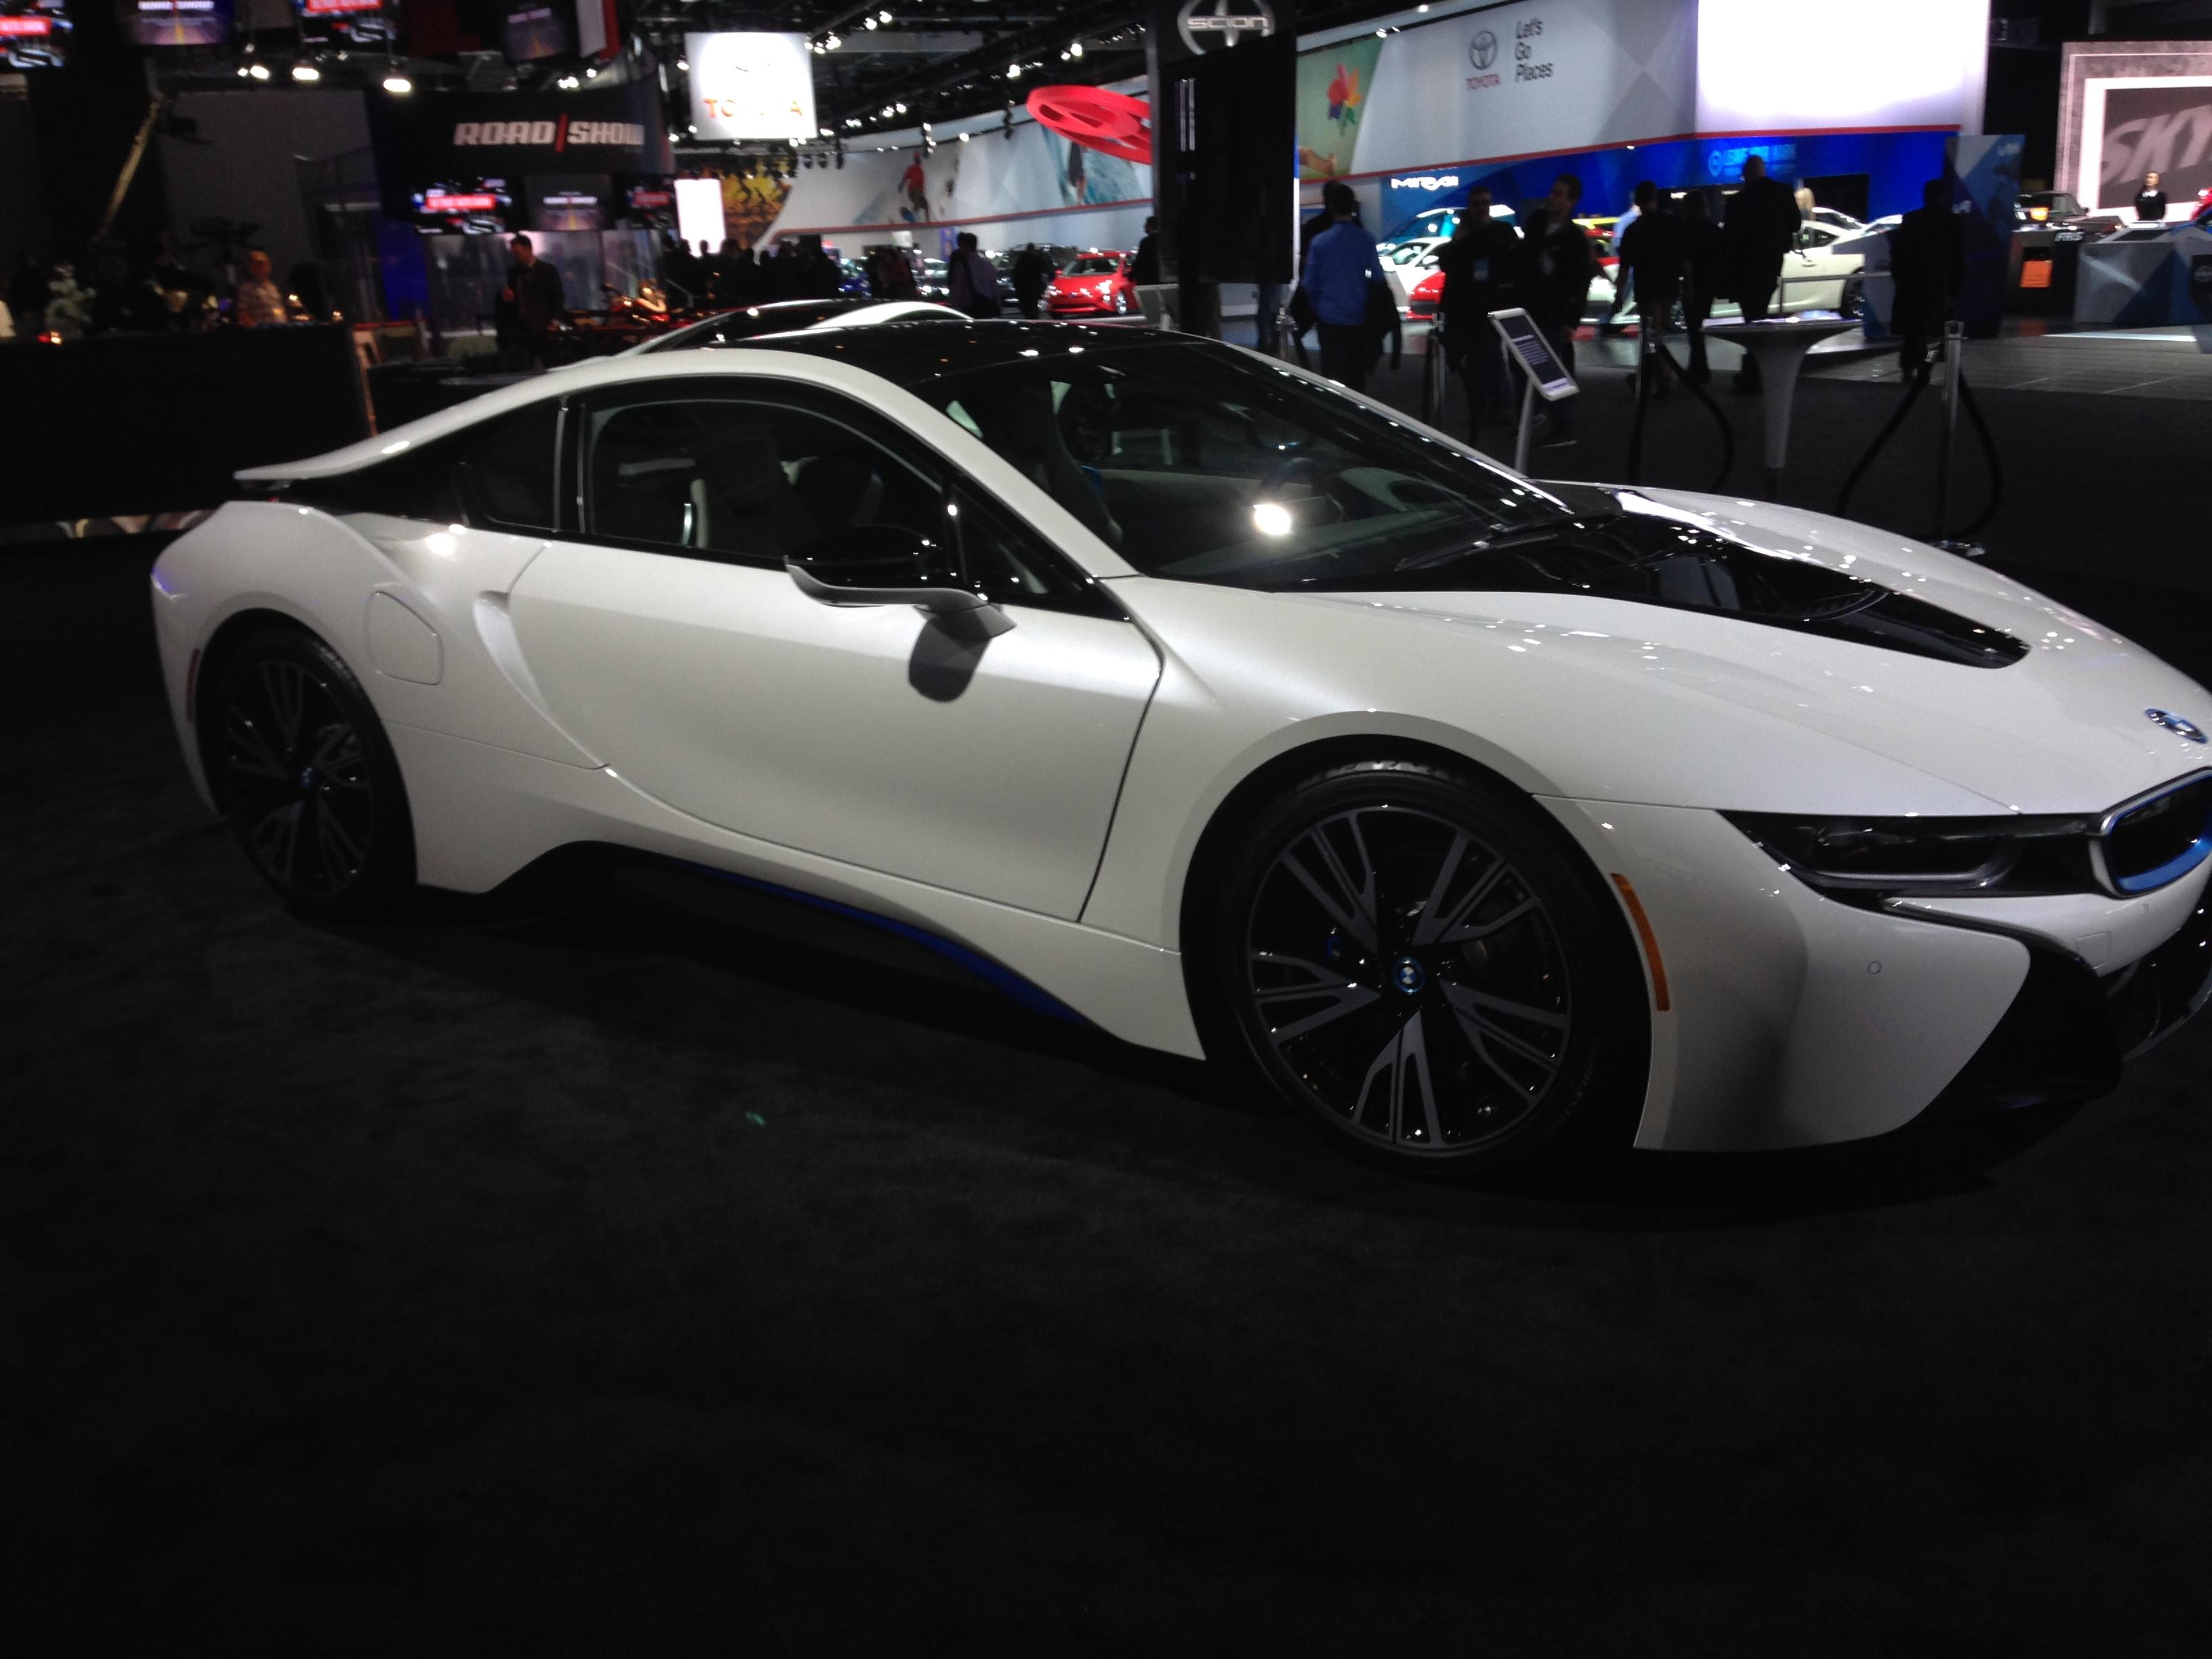 BMW i8. Hybrid electric car. 357hp. Tires Bridgestone Potenza